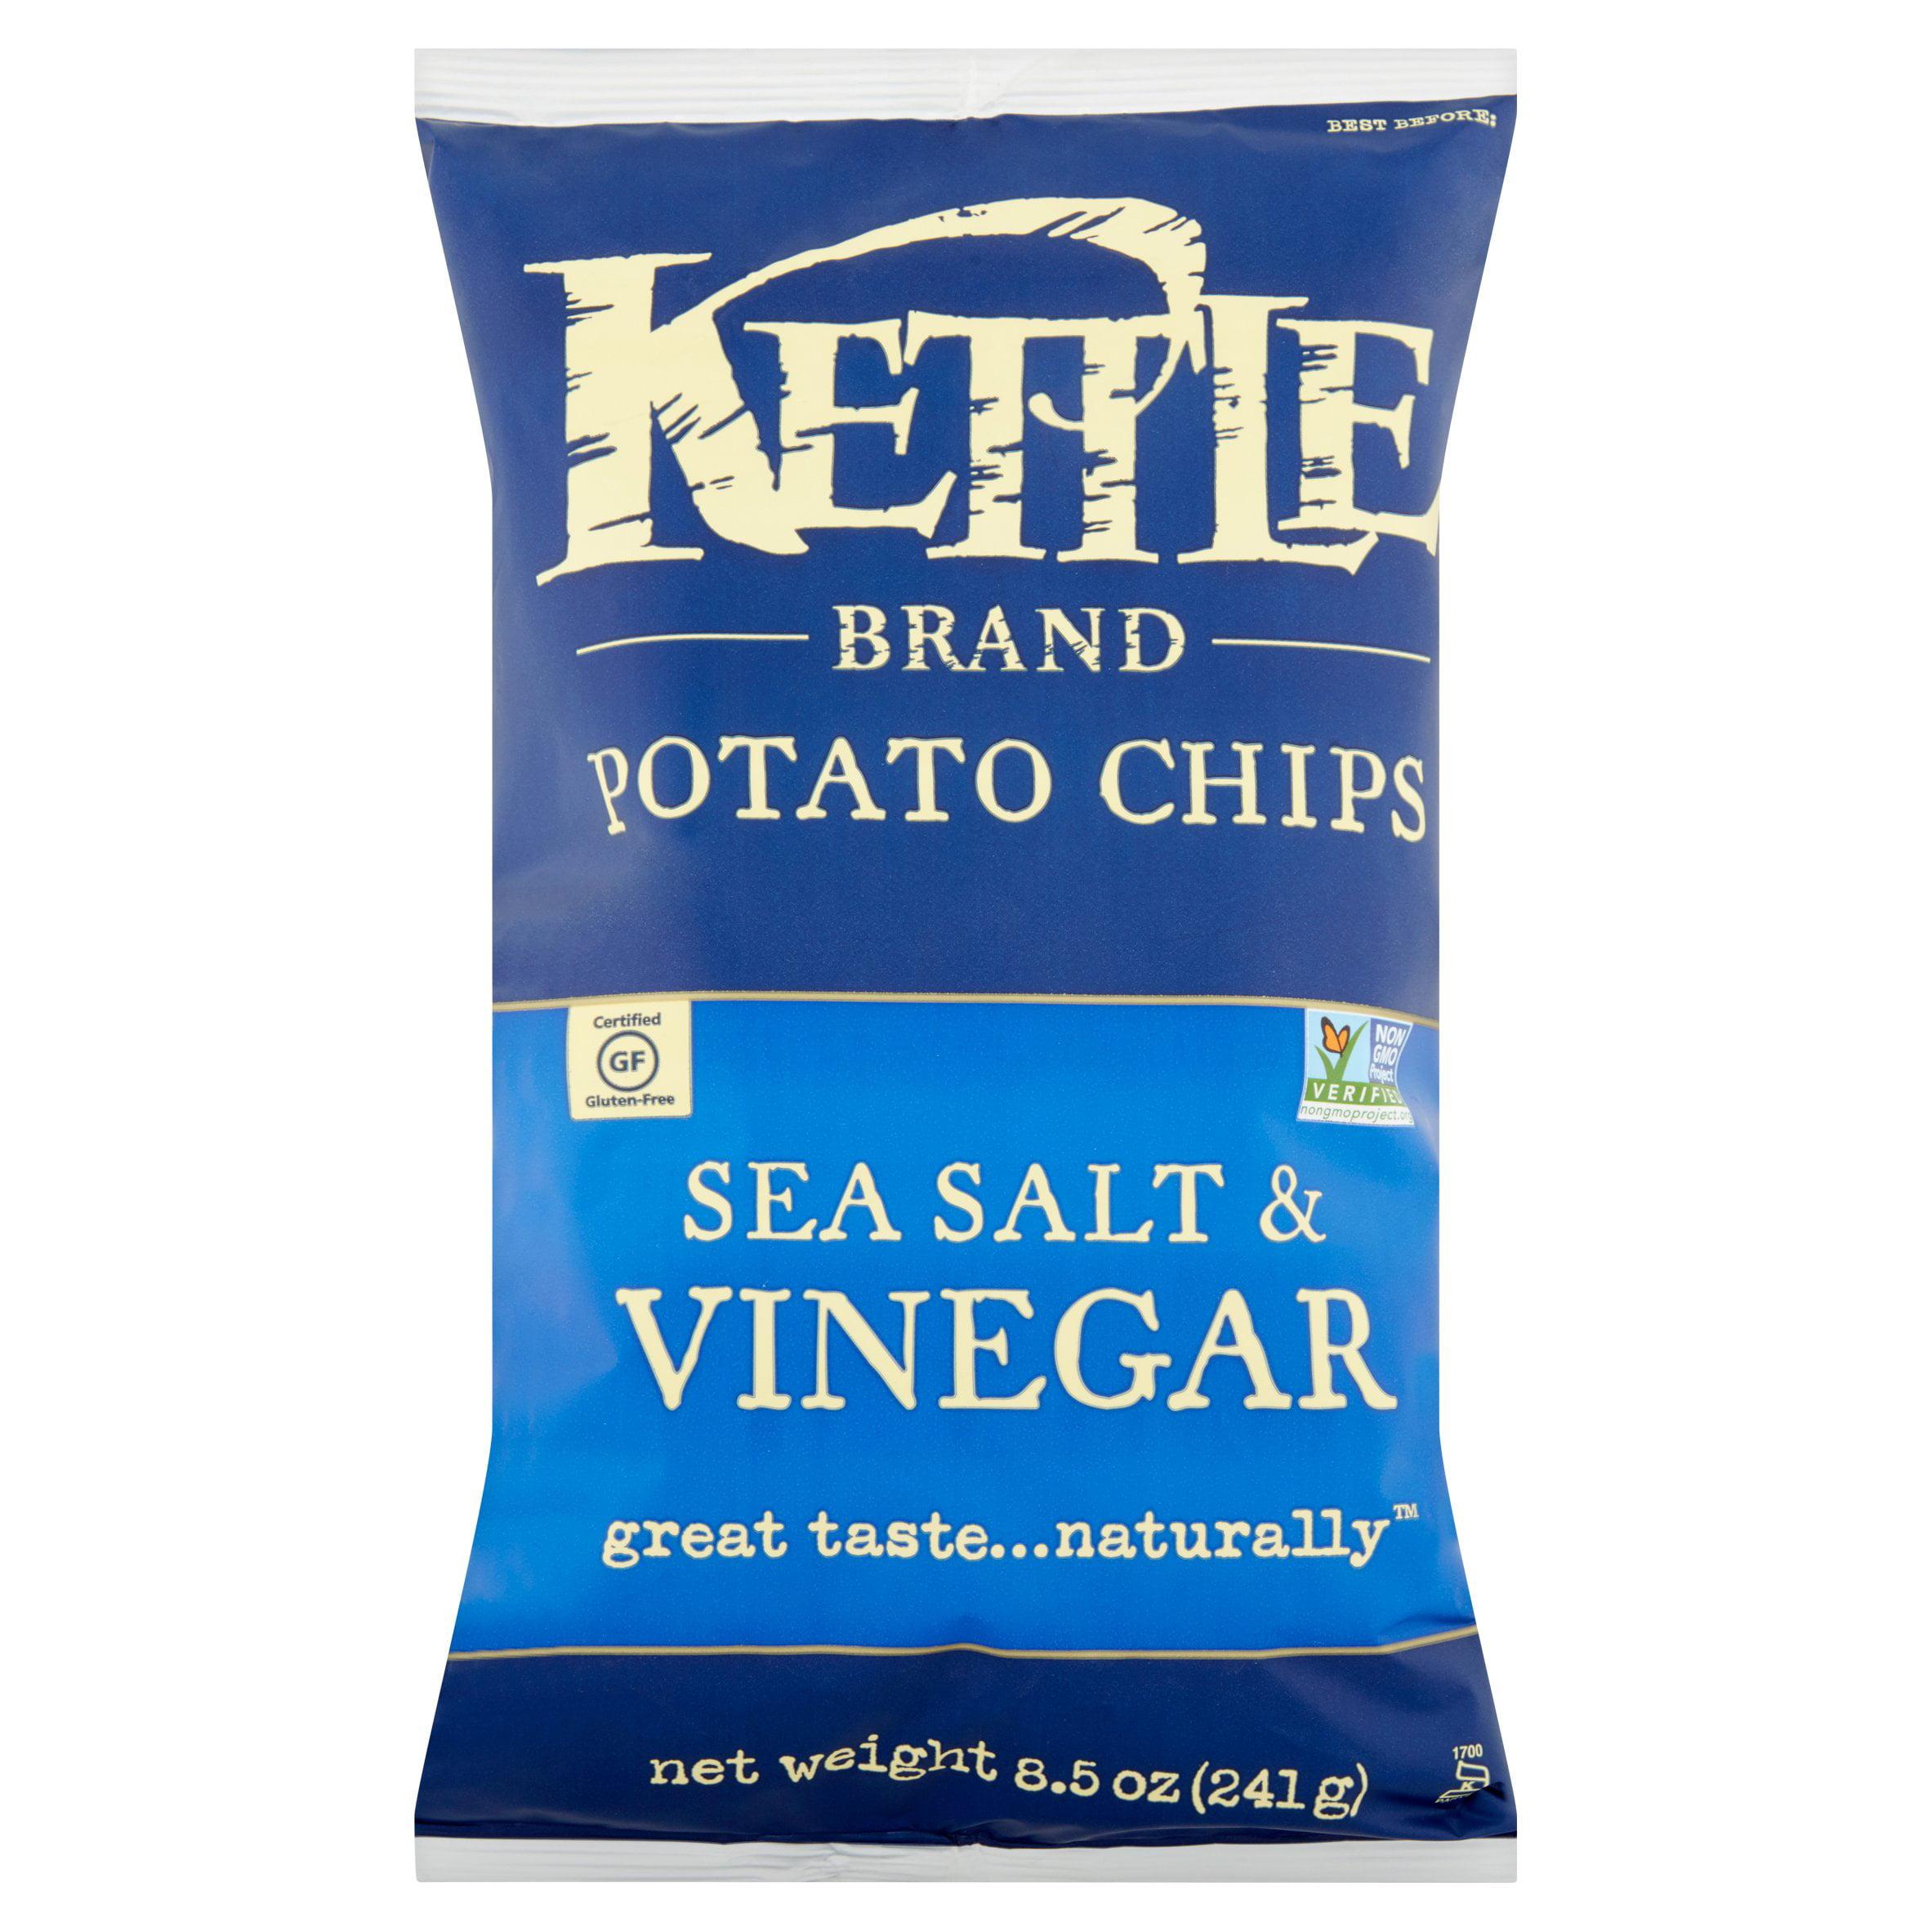 Kettle Brand Sea Salt & Vinegar Potato Chips, 8.5 oz by Kettle Foods, Inc.